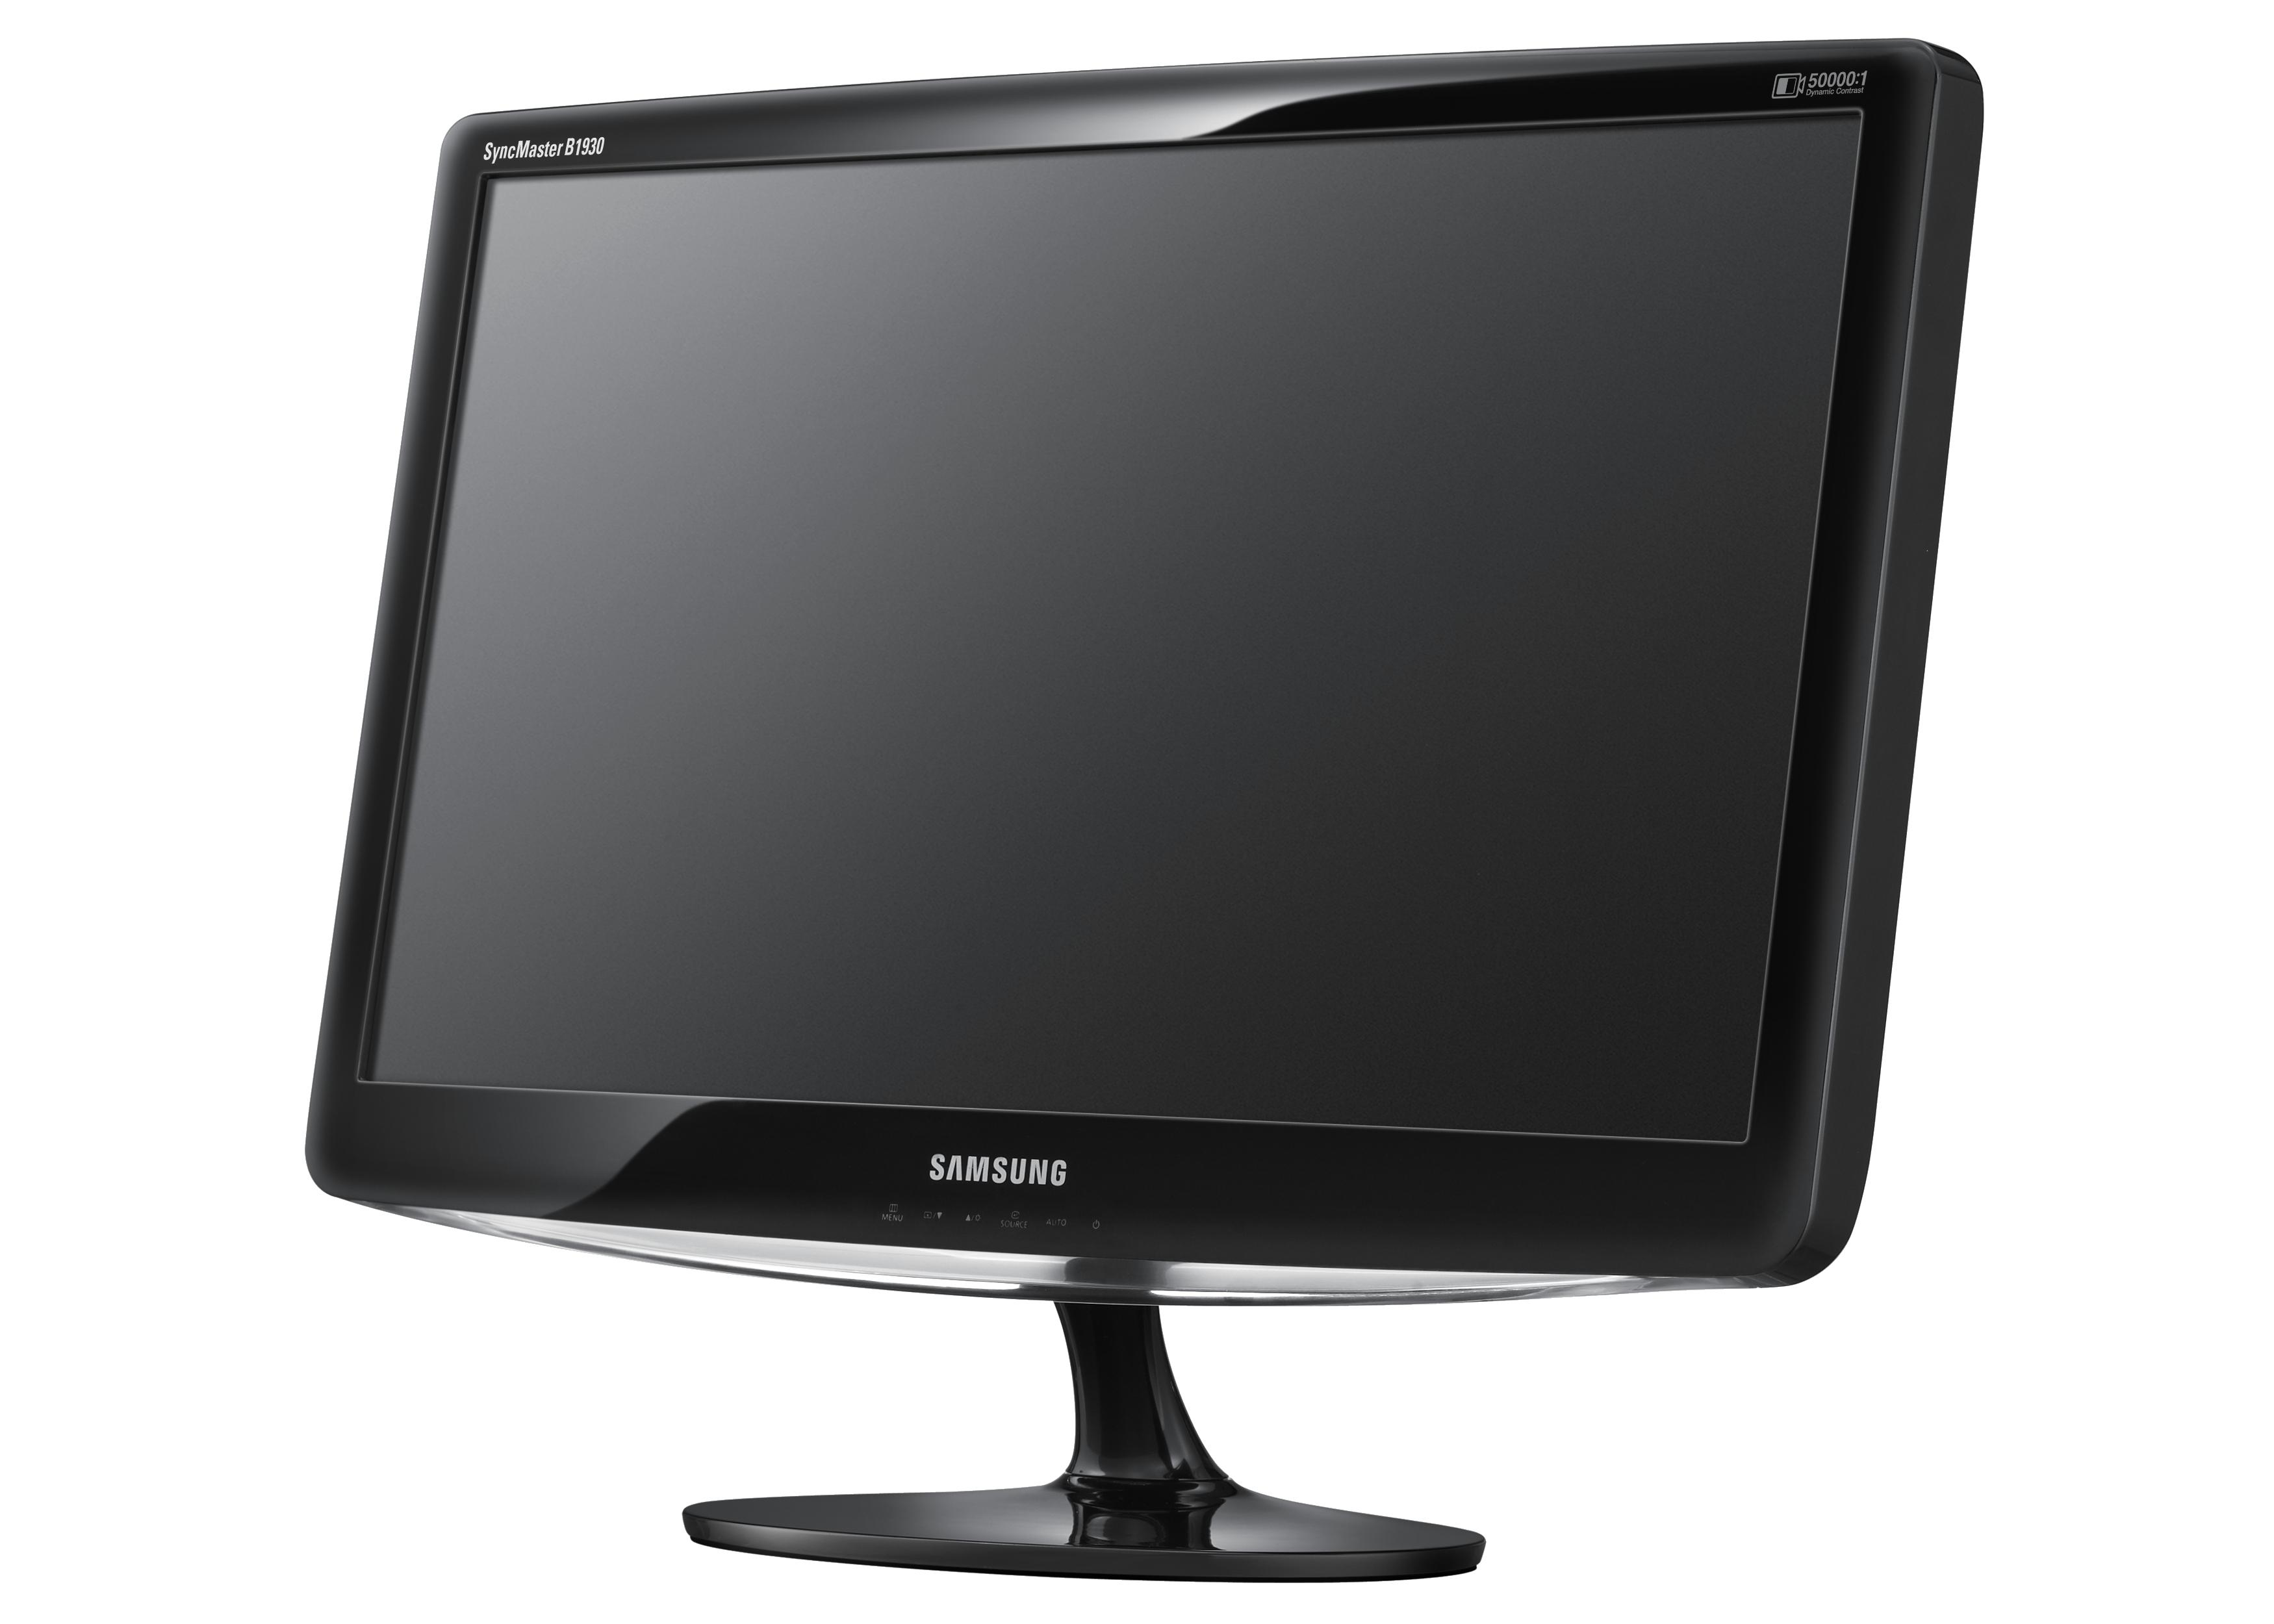 Lcd Monitor PNG - 68200